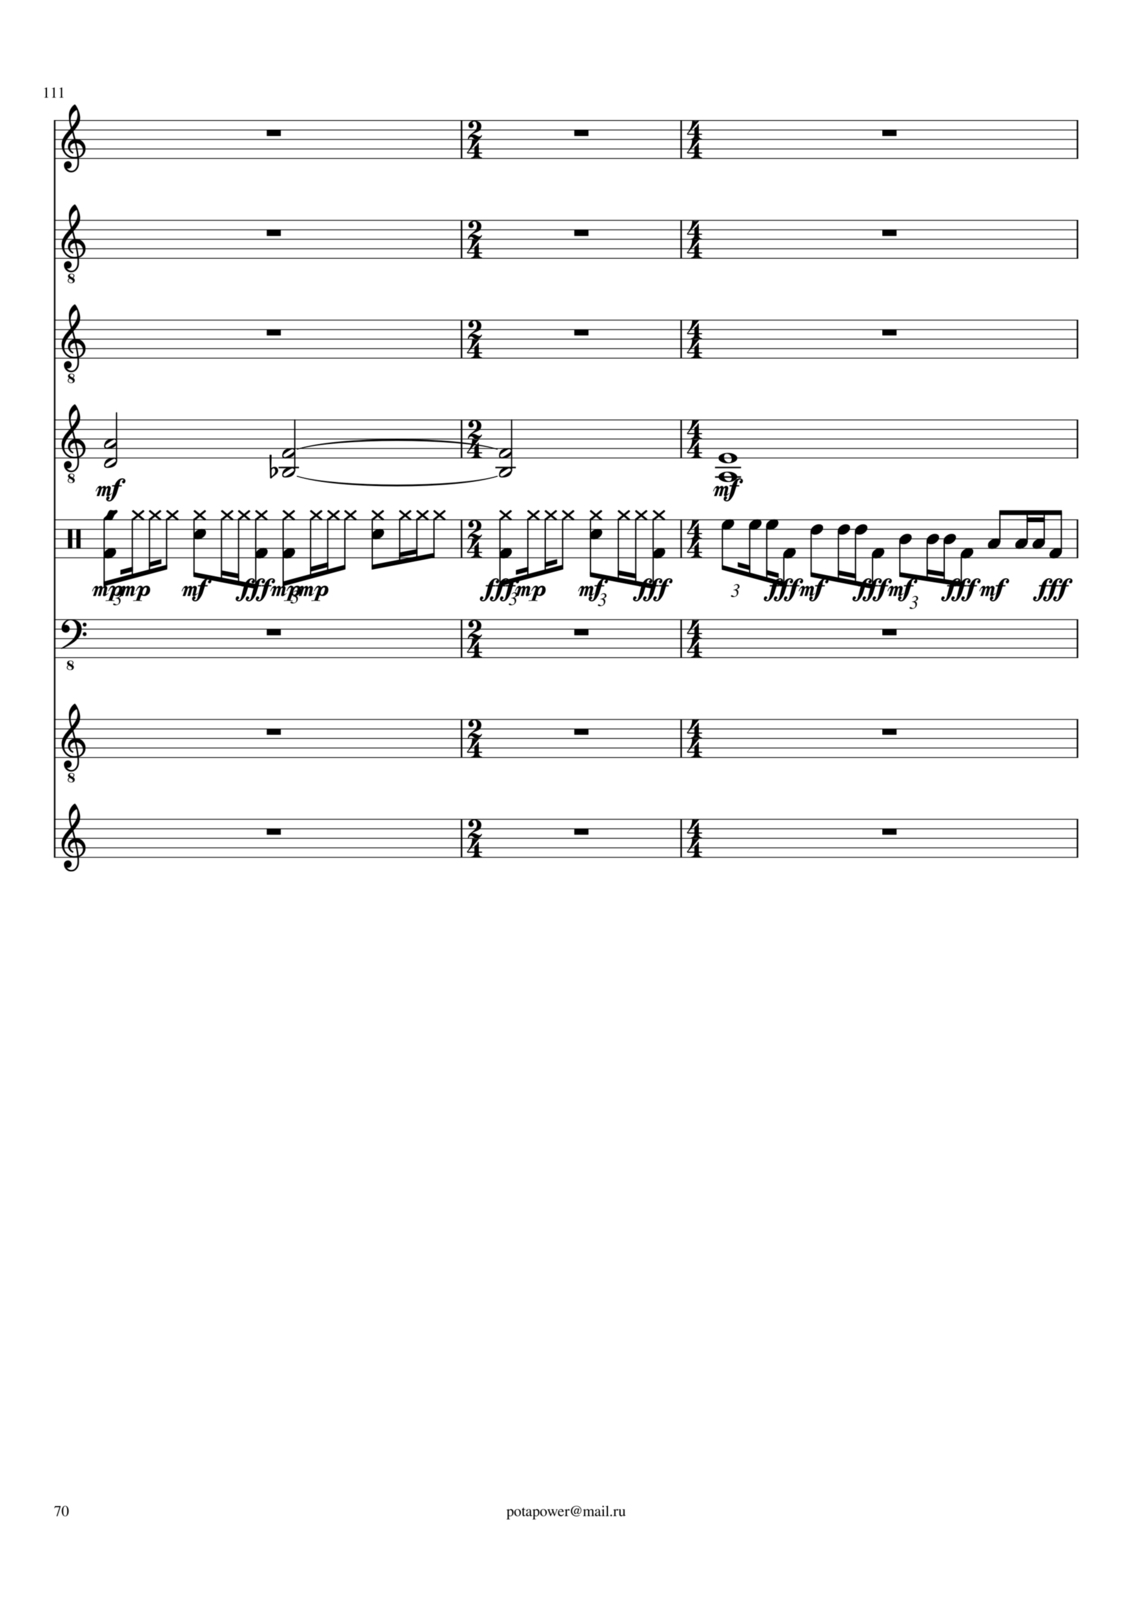 Korolevstvo slez slide, Image 70